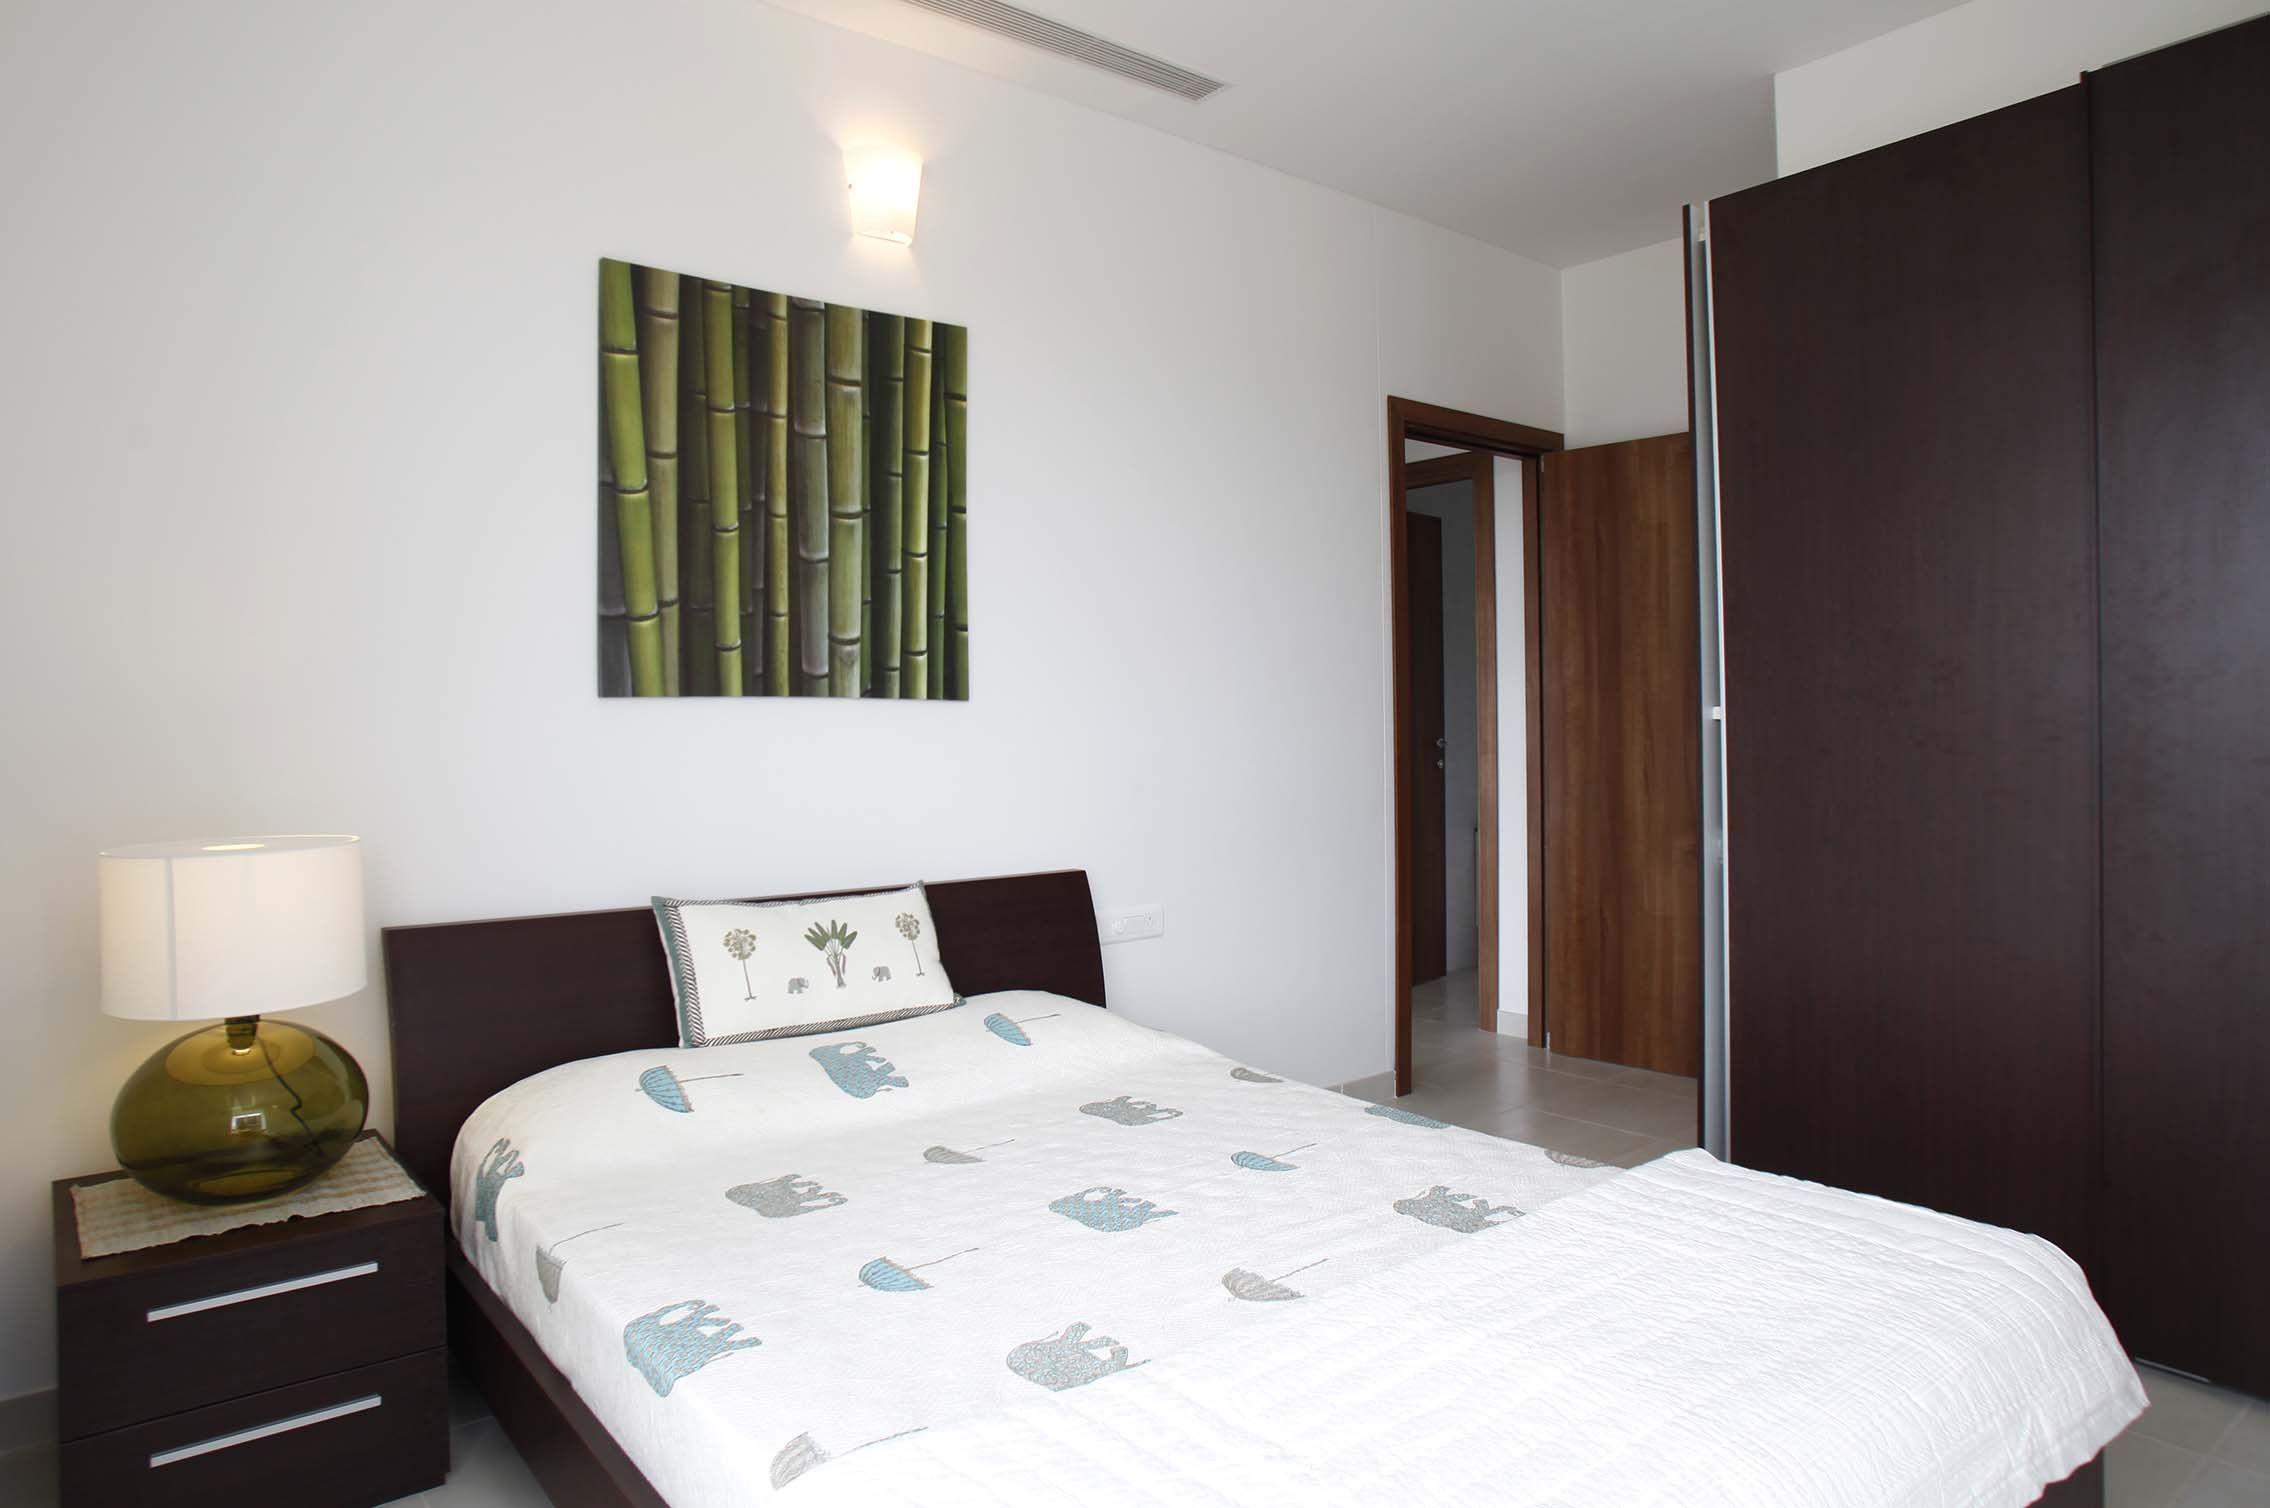 #interior #design #city #bhartiya #bhartiyacity #nikoo #homes #lifestyle